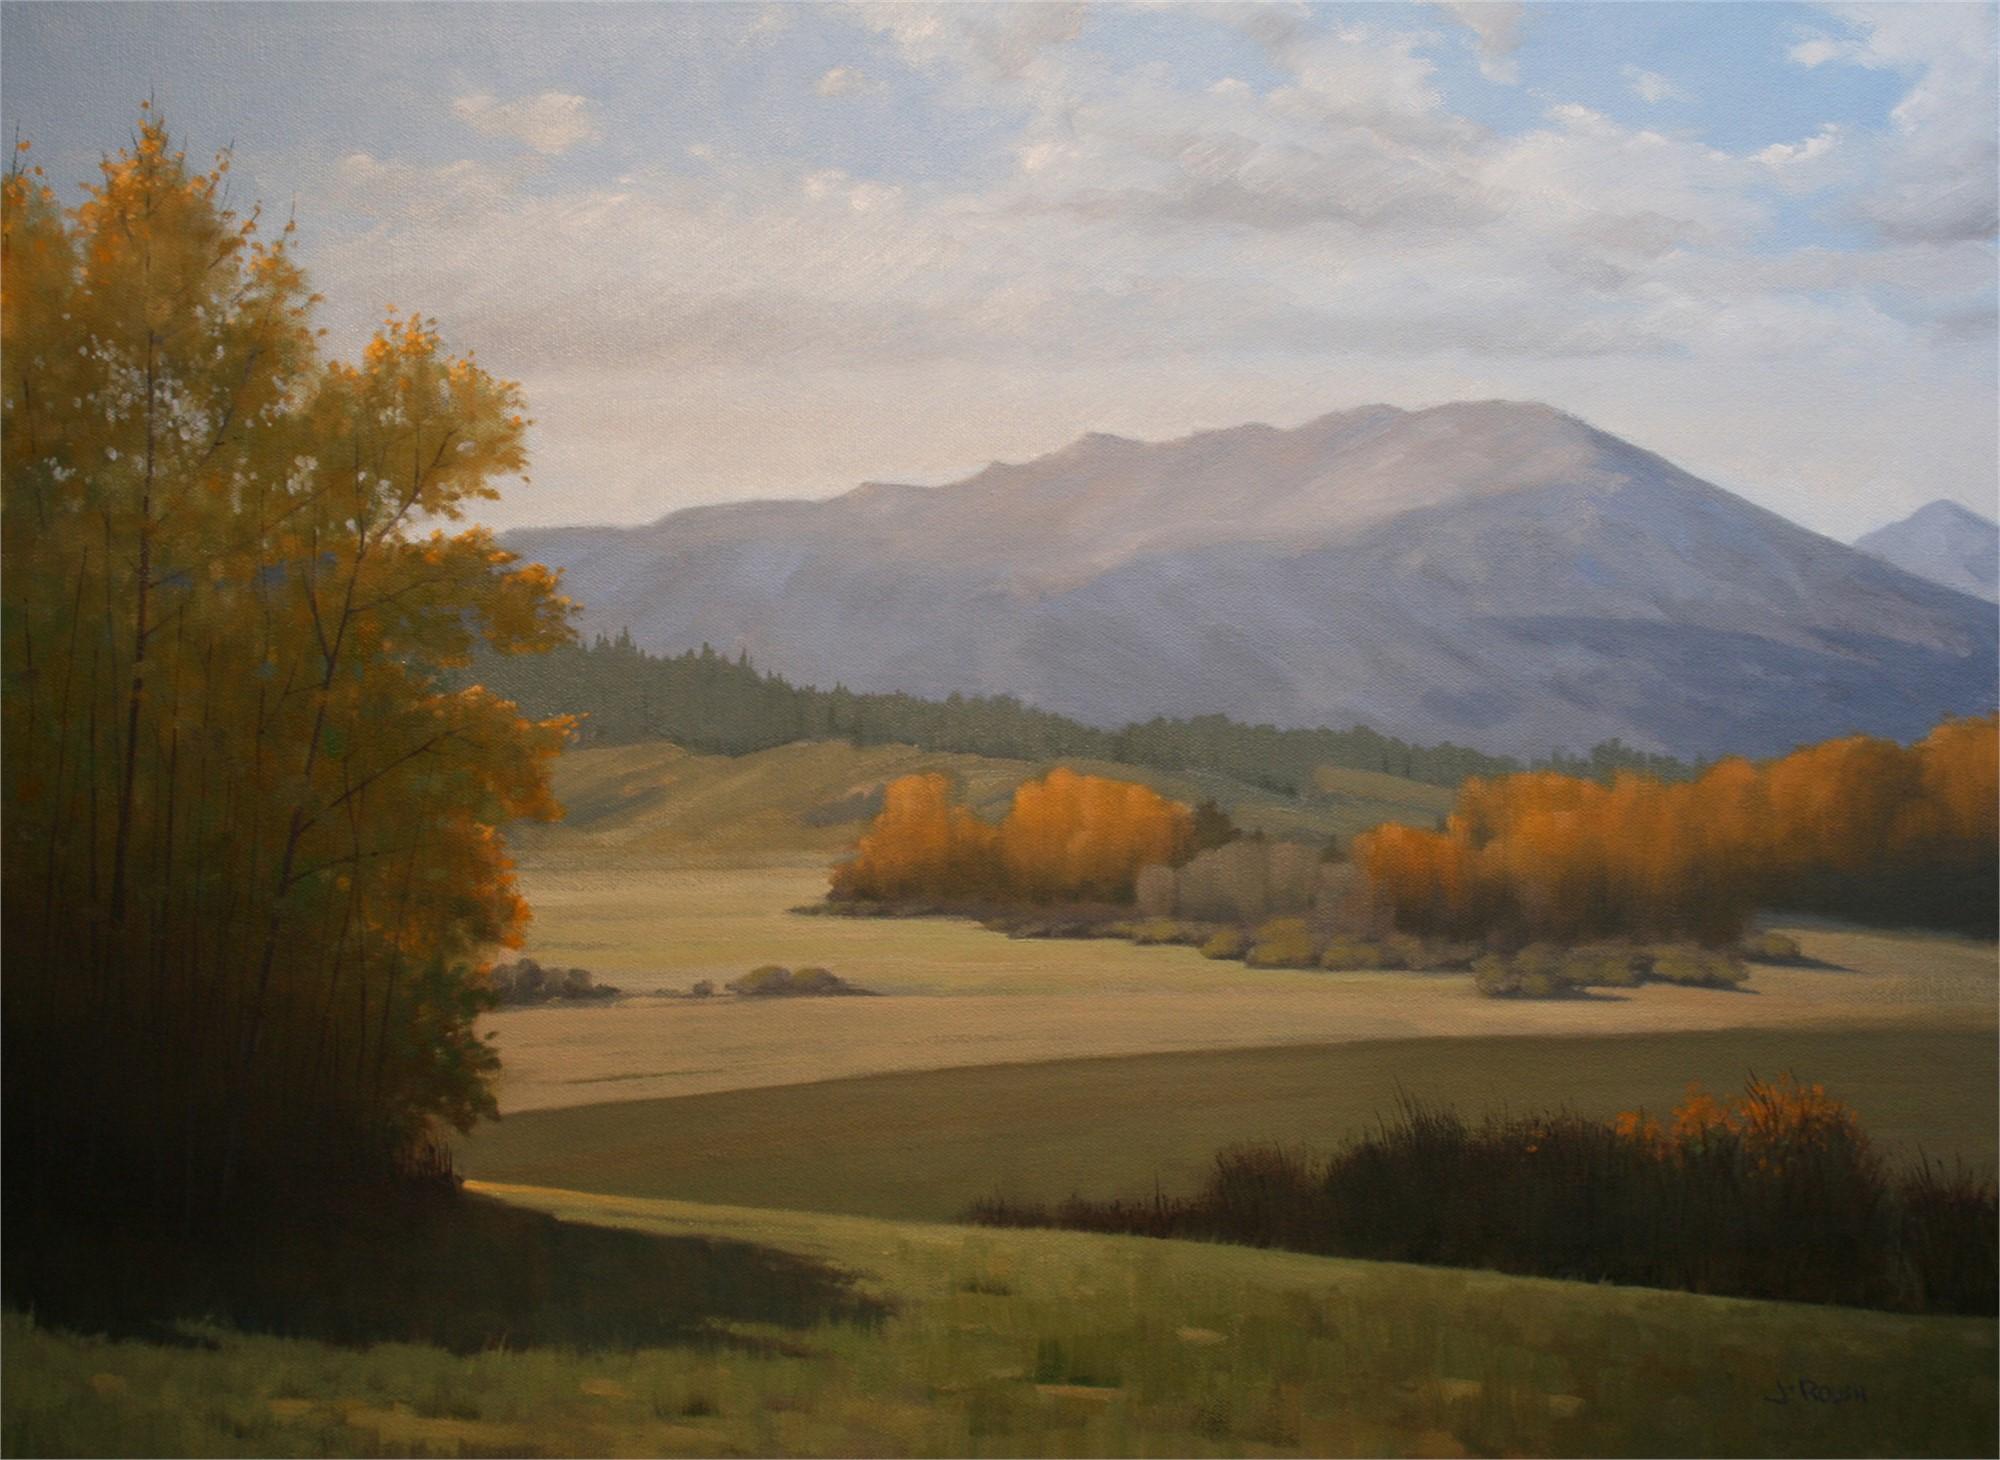 Late Summer by John Roush